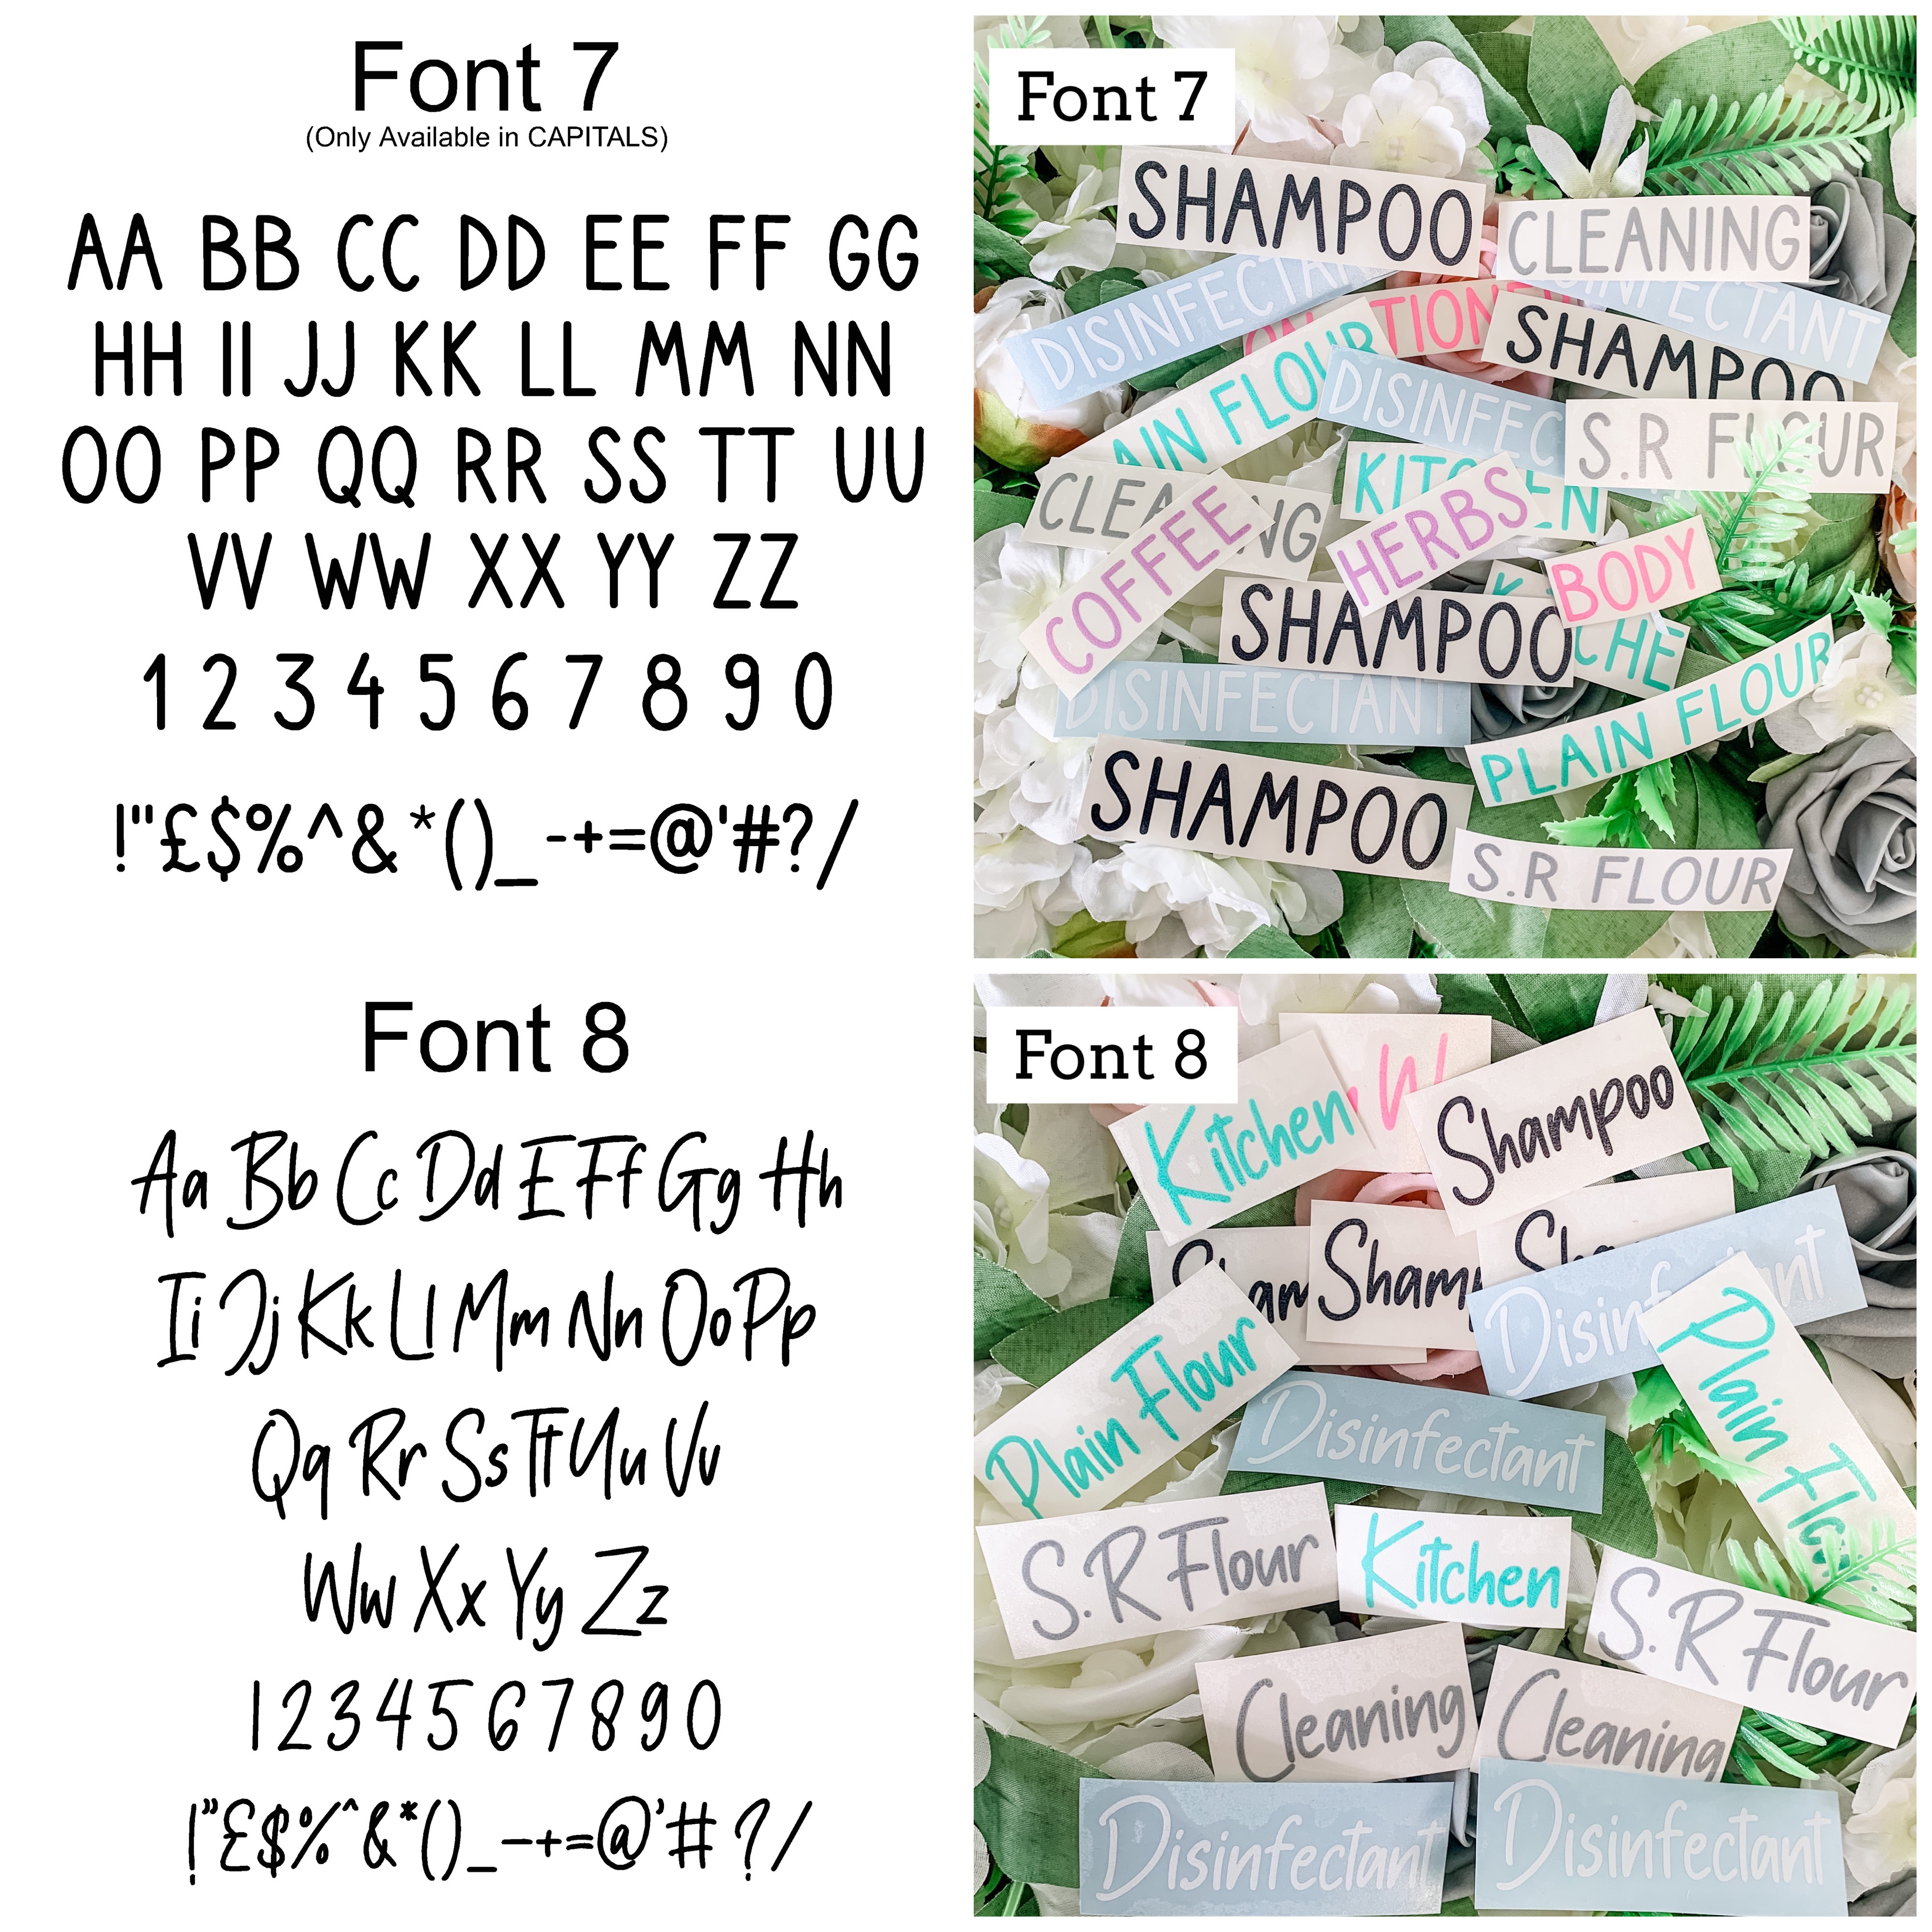 8e030ecf-a28d-4186-be4b-be65102b4450.jpeg